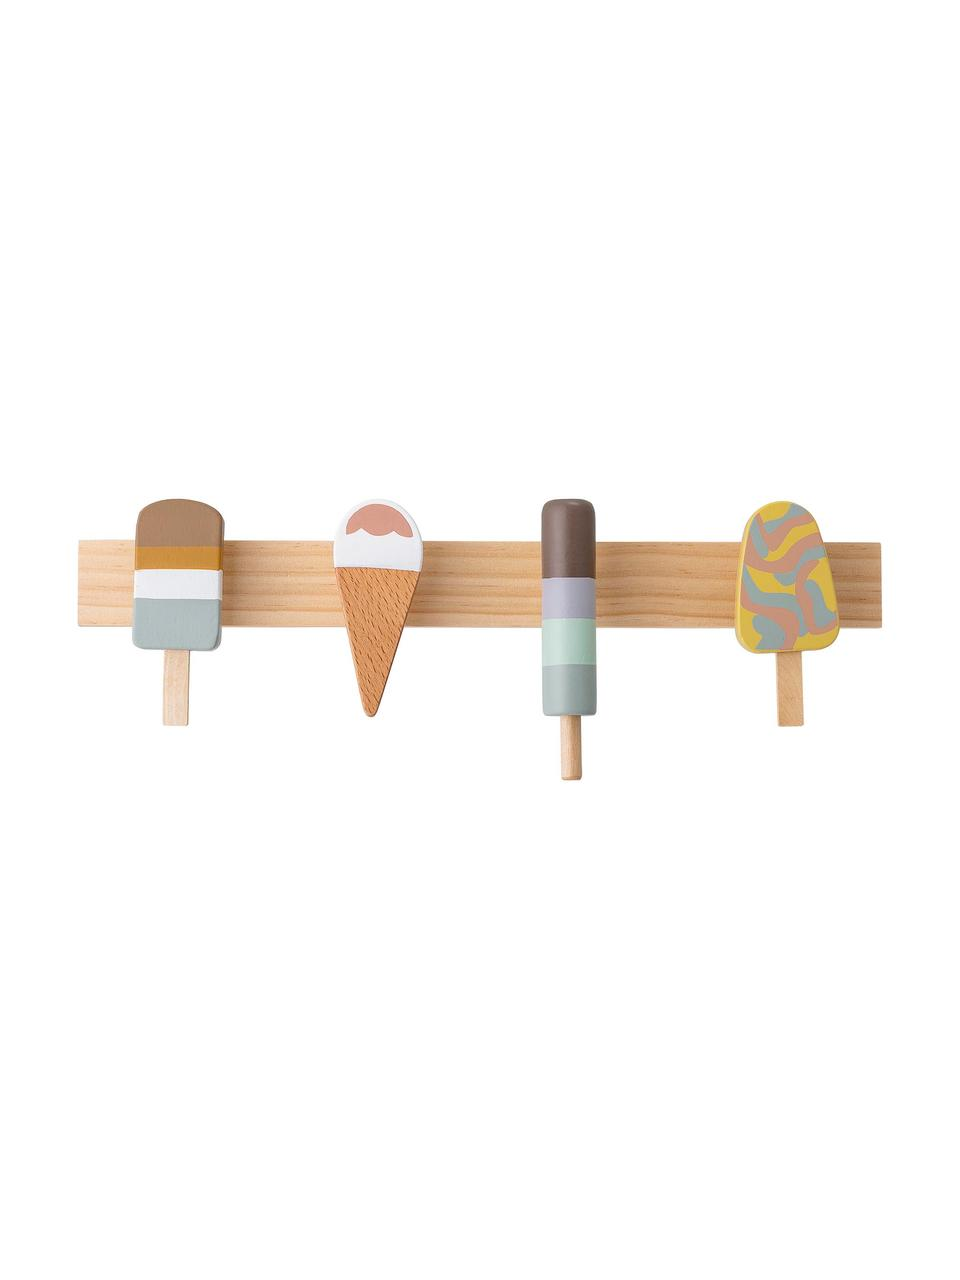 Wandgarderobe Ice Creams, Buchenholz, Lotusholz, Metall, Mehrfarbig, 38 x 13 cm